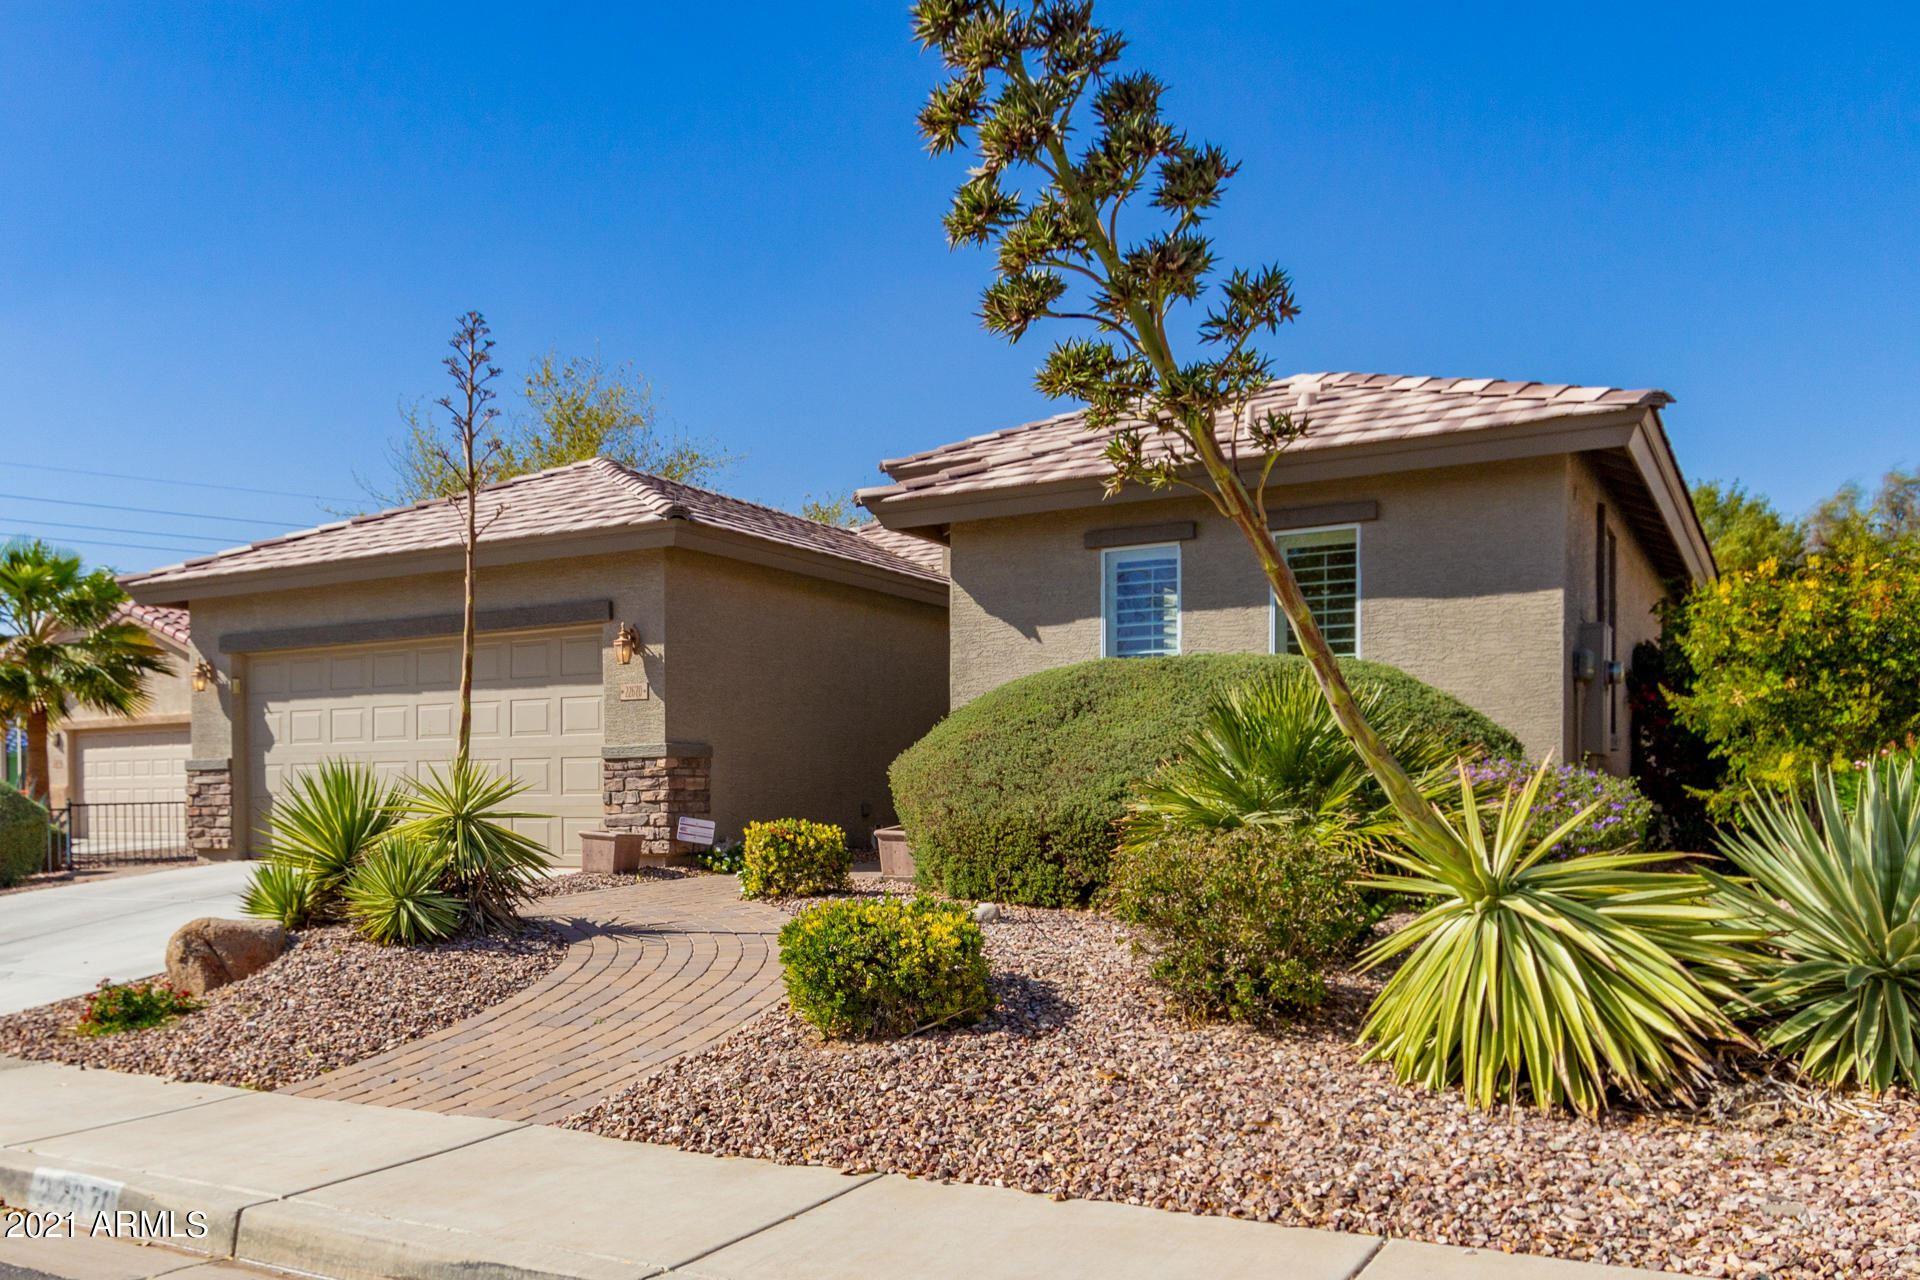 Photo of 22670 W ANTELOPE Trail, Buckeye, AZ 85326 (MLS # 6200481)